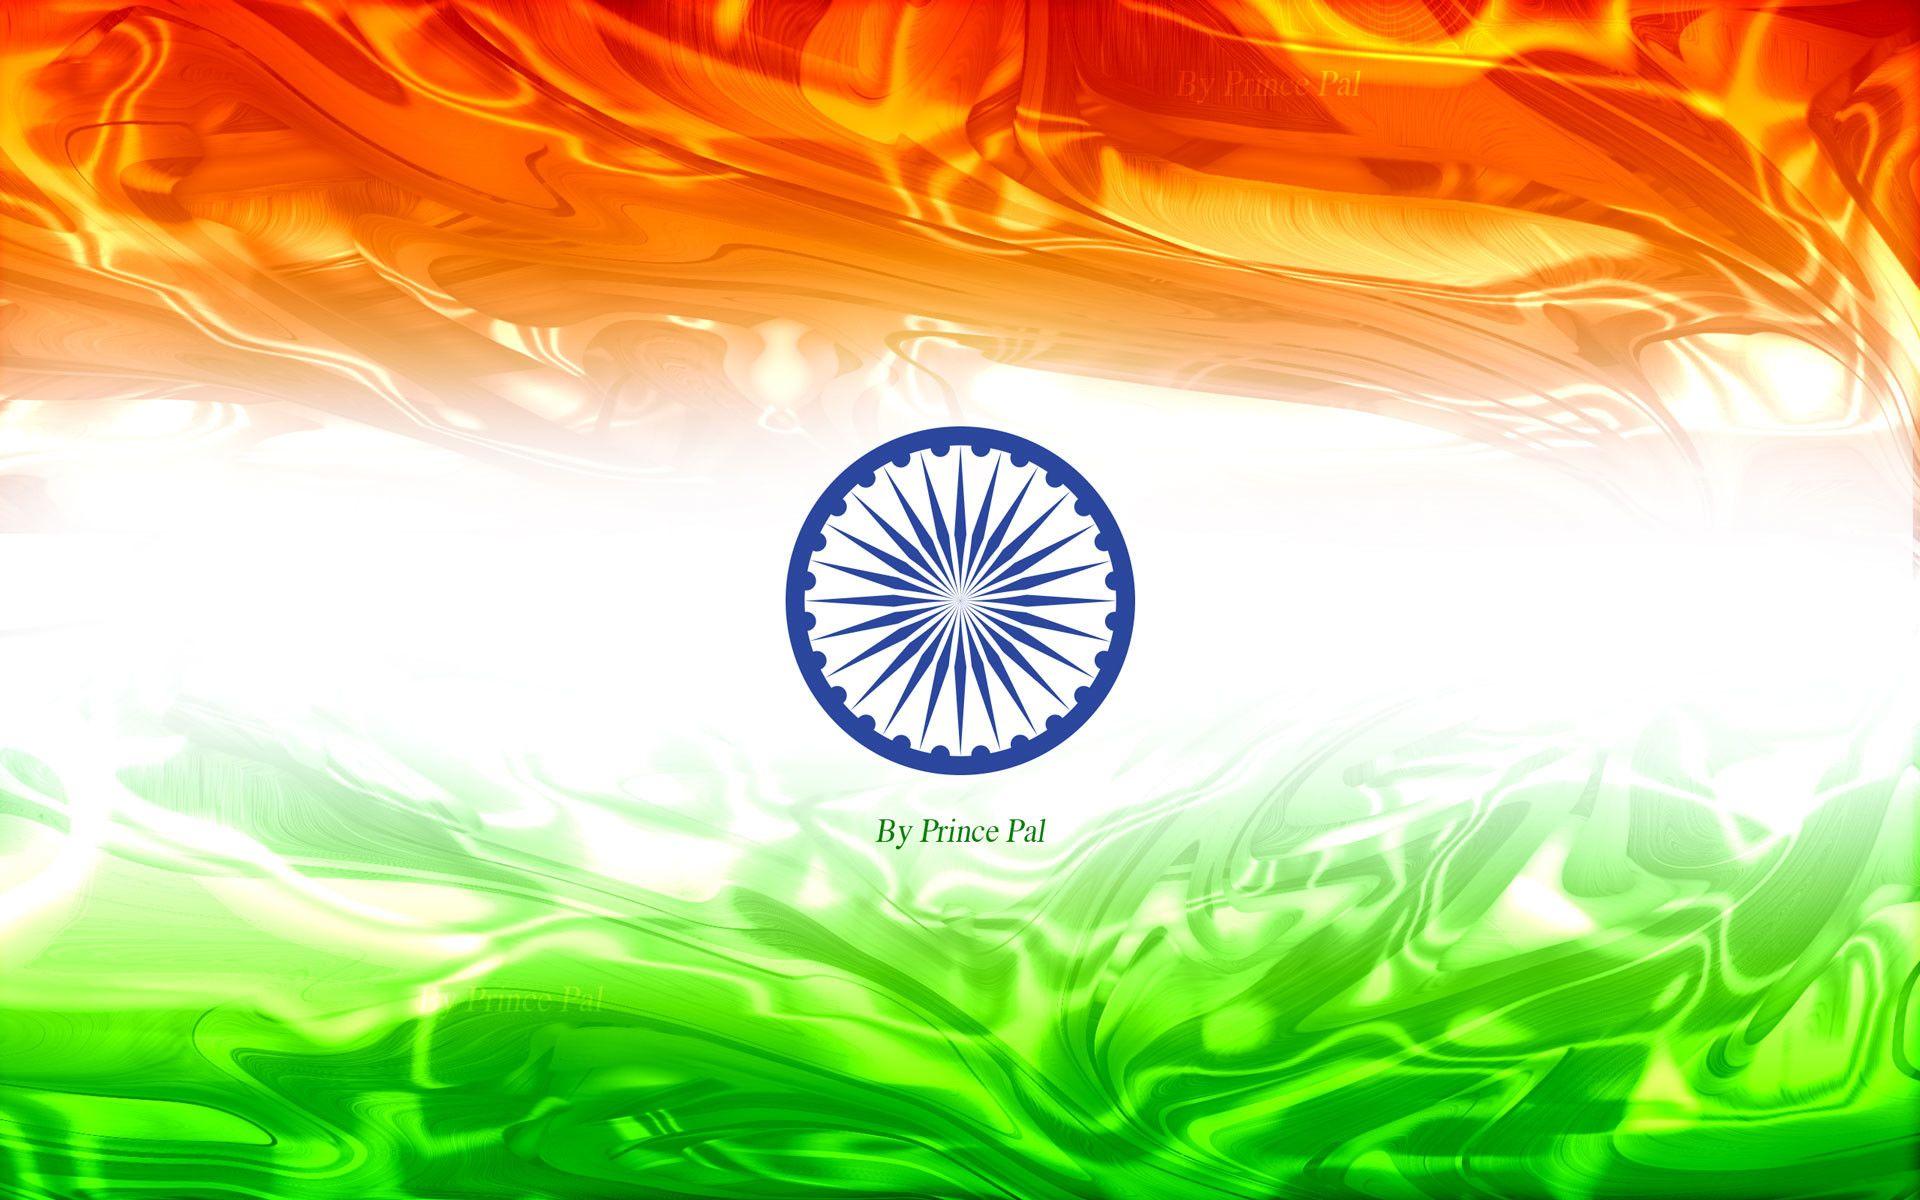 1920x1200 Mobile wallpaper · India Flag Indian flag